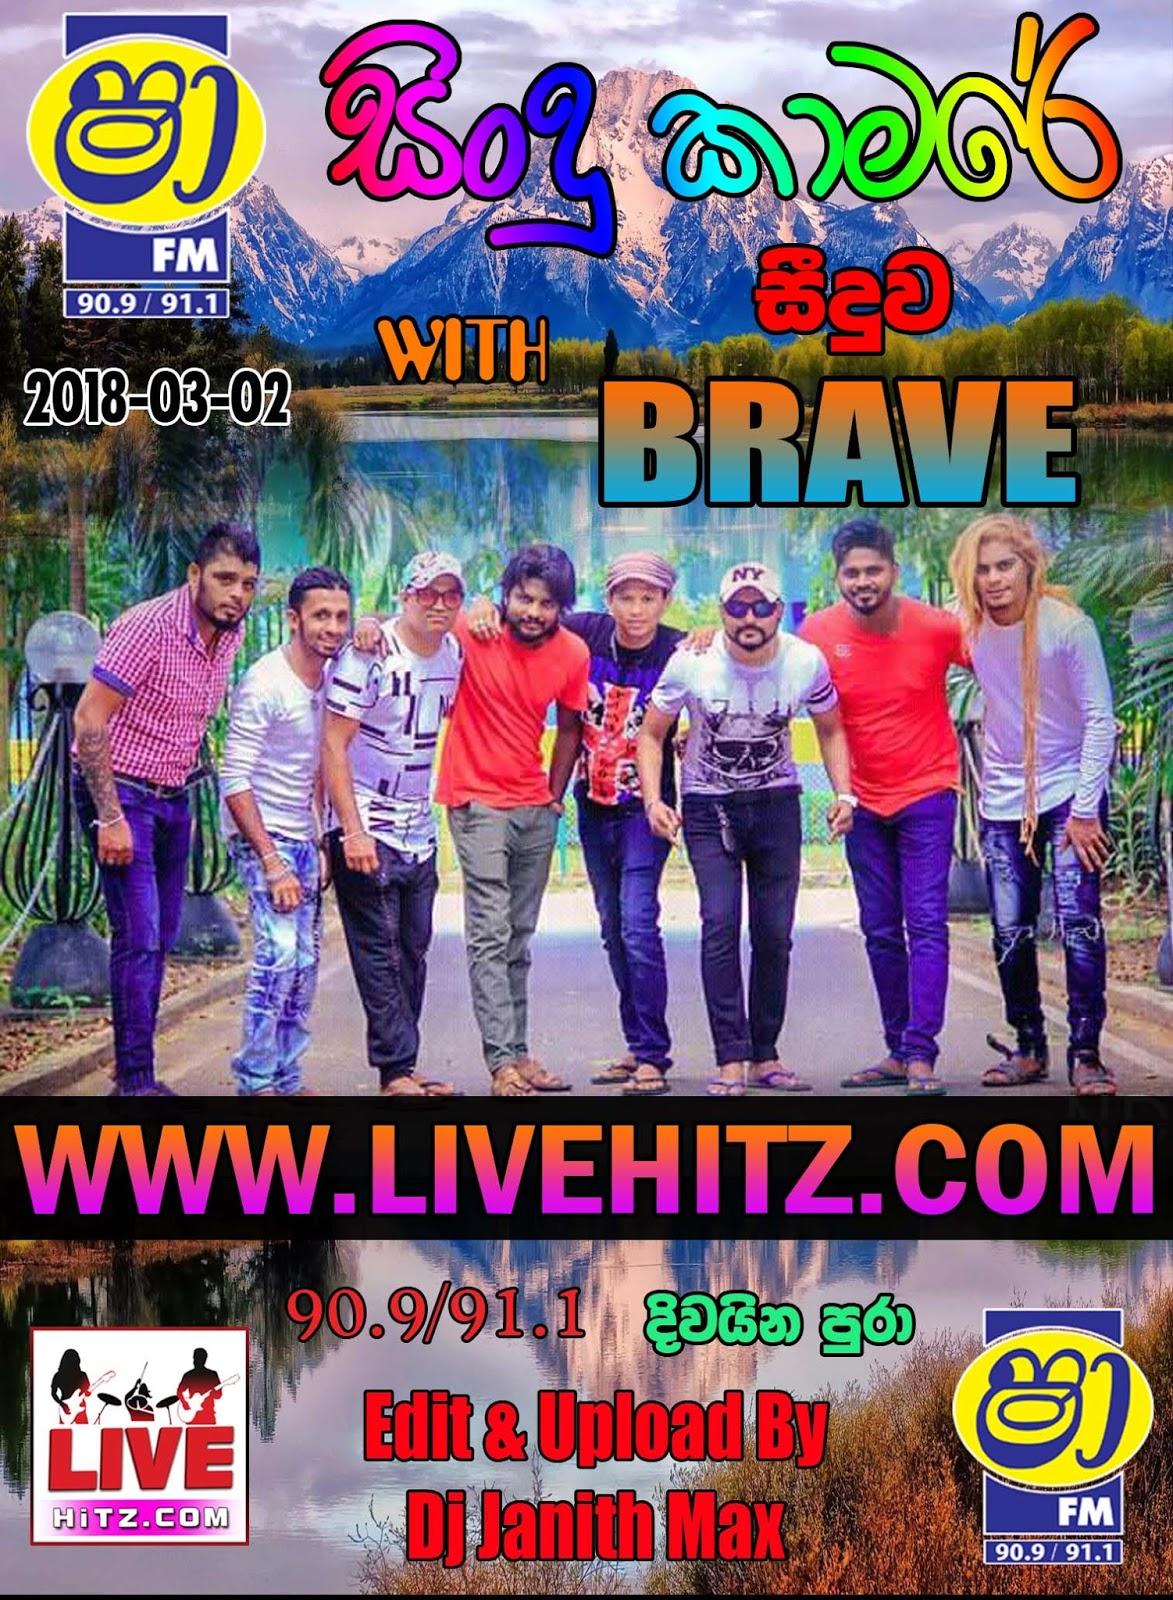 SHAA FM SINDU KAMARE WITH SEEDUWA BRAVE 2018-03-02 ~ WwW